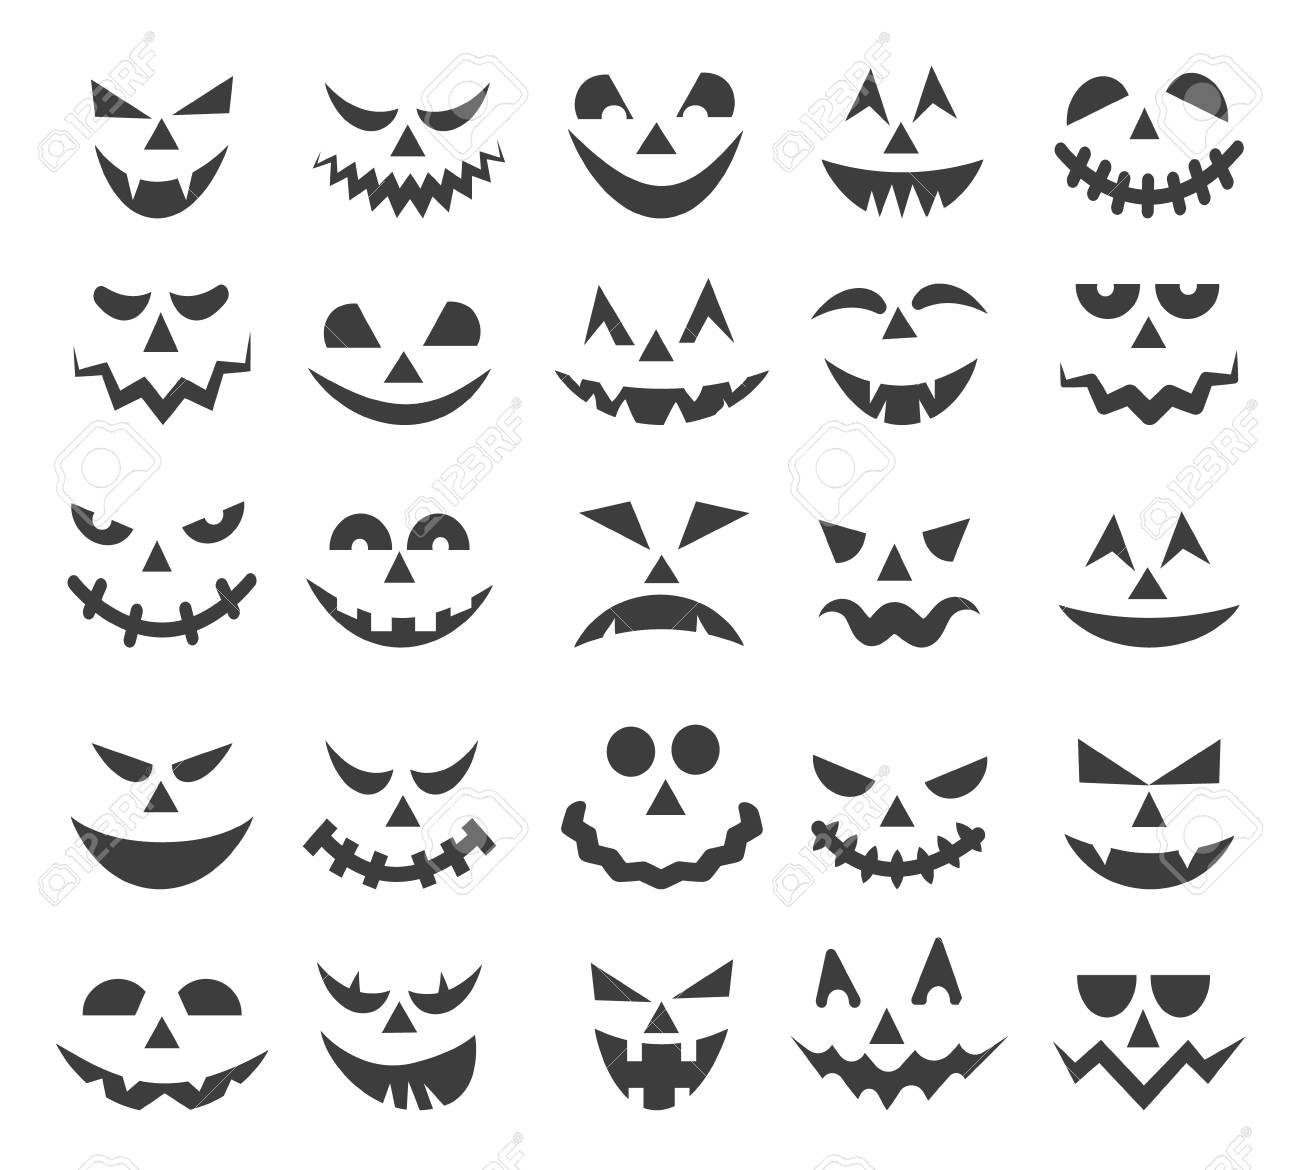 Halloween Ghost Faces Scary Pumpkin Devils Smiles Spooky Jack